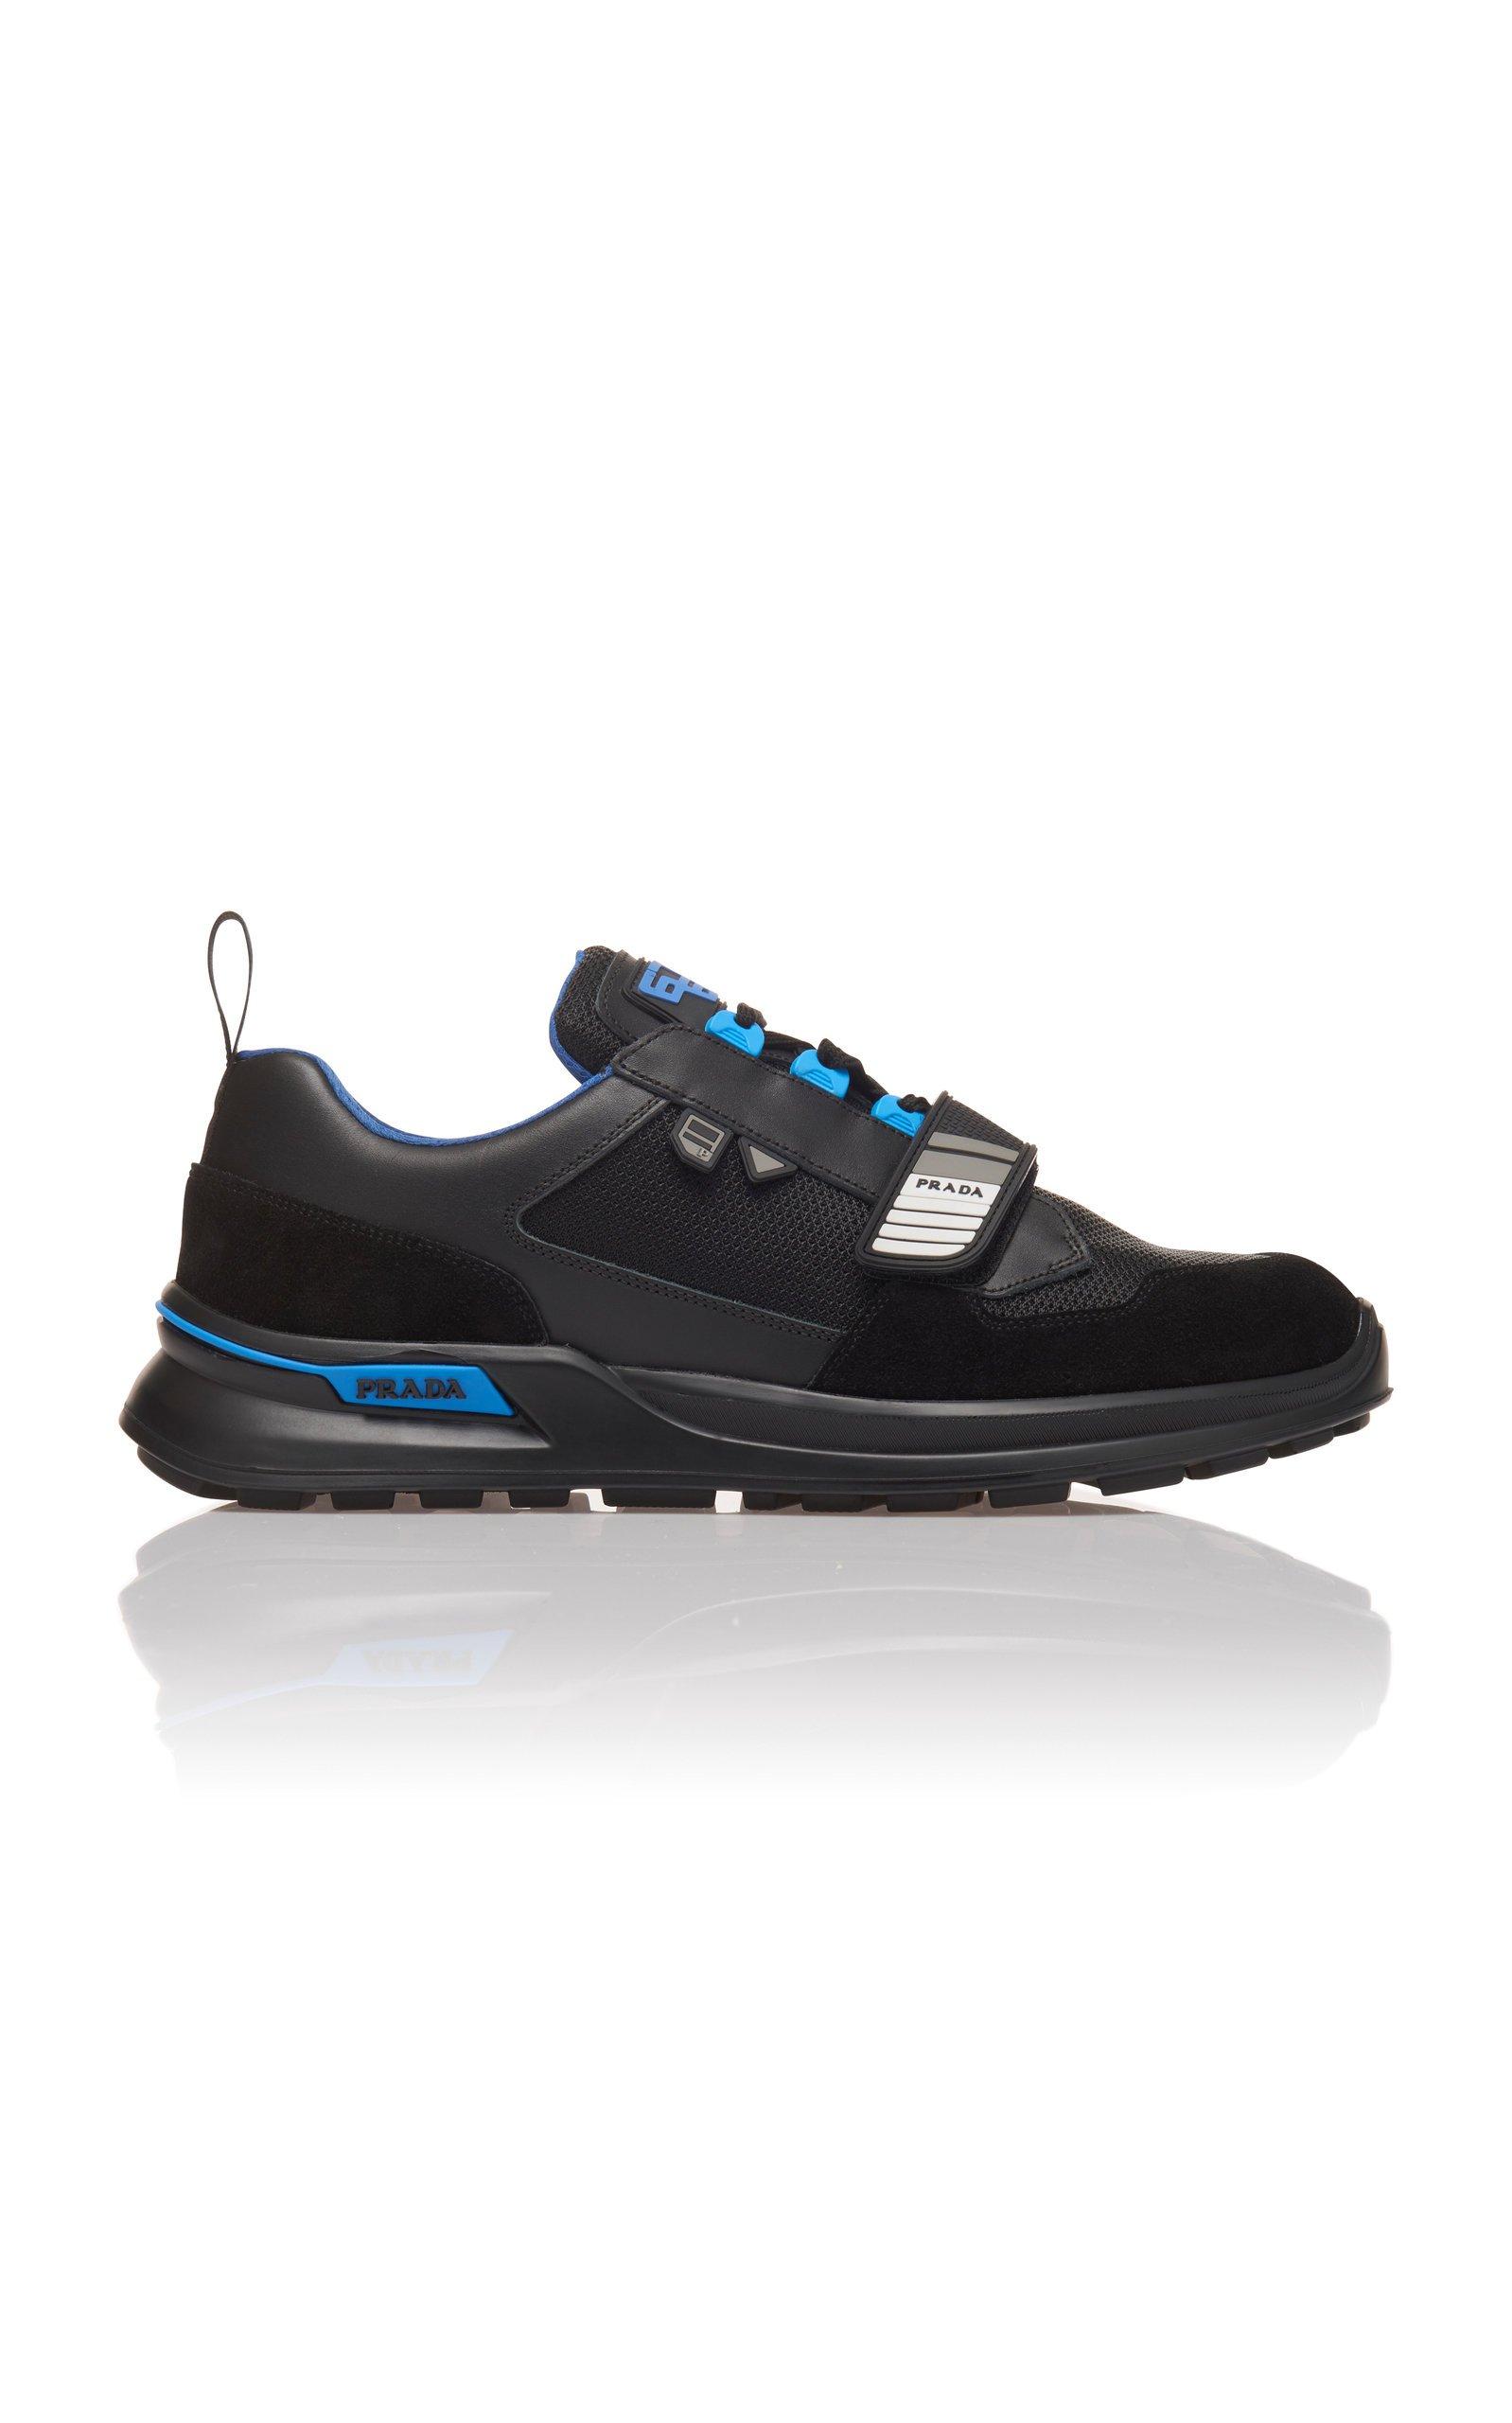 Velcro Work Sneakers By Prada | Moda